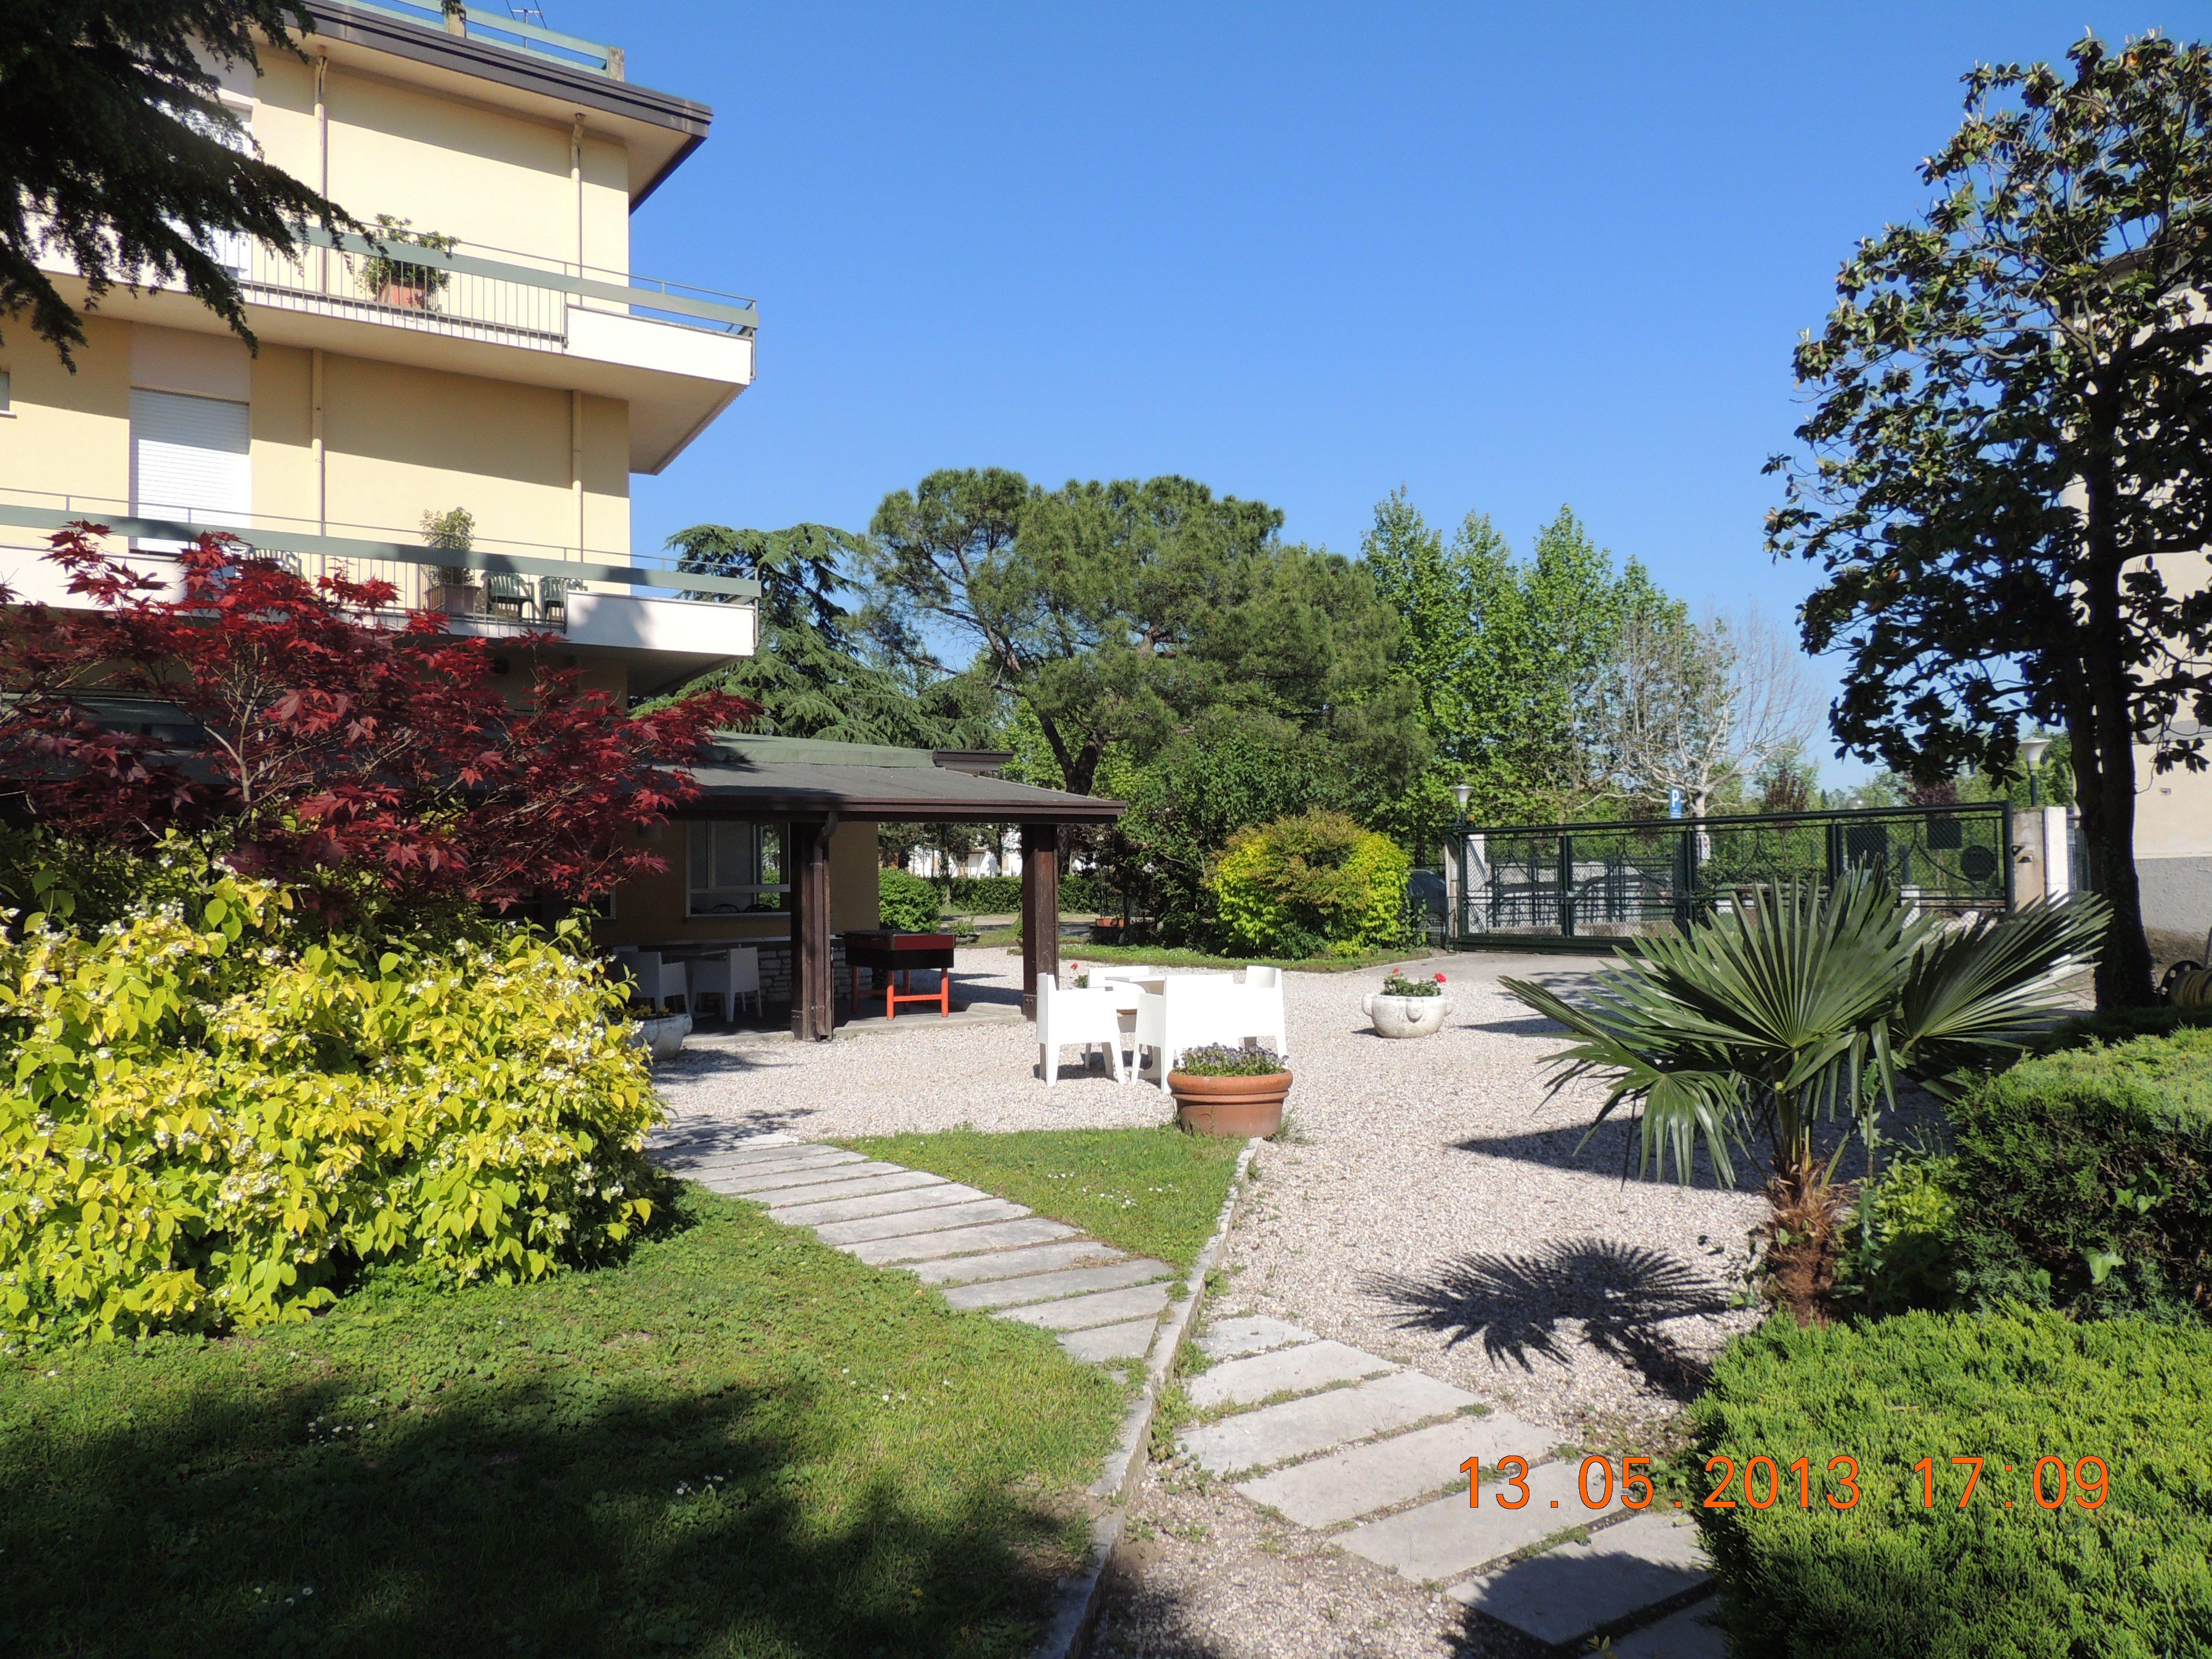 Lago di Garda Hotel zzGASPARINA